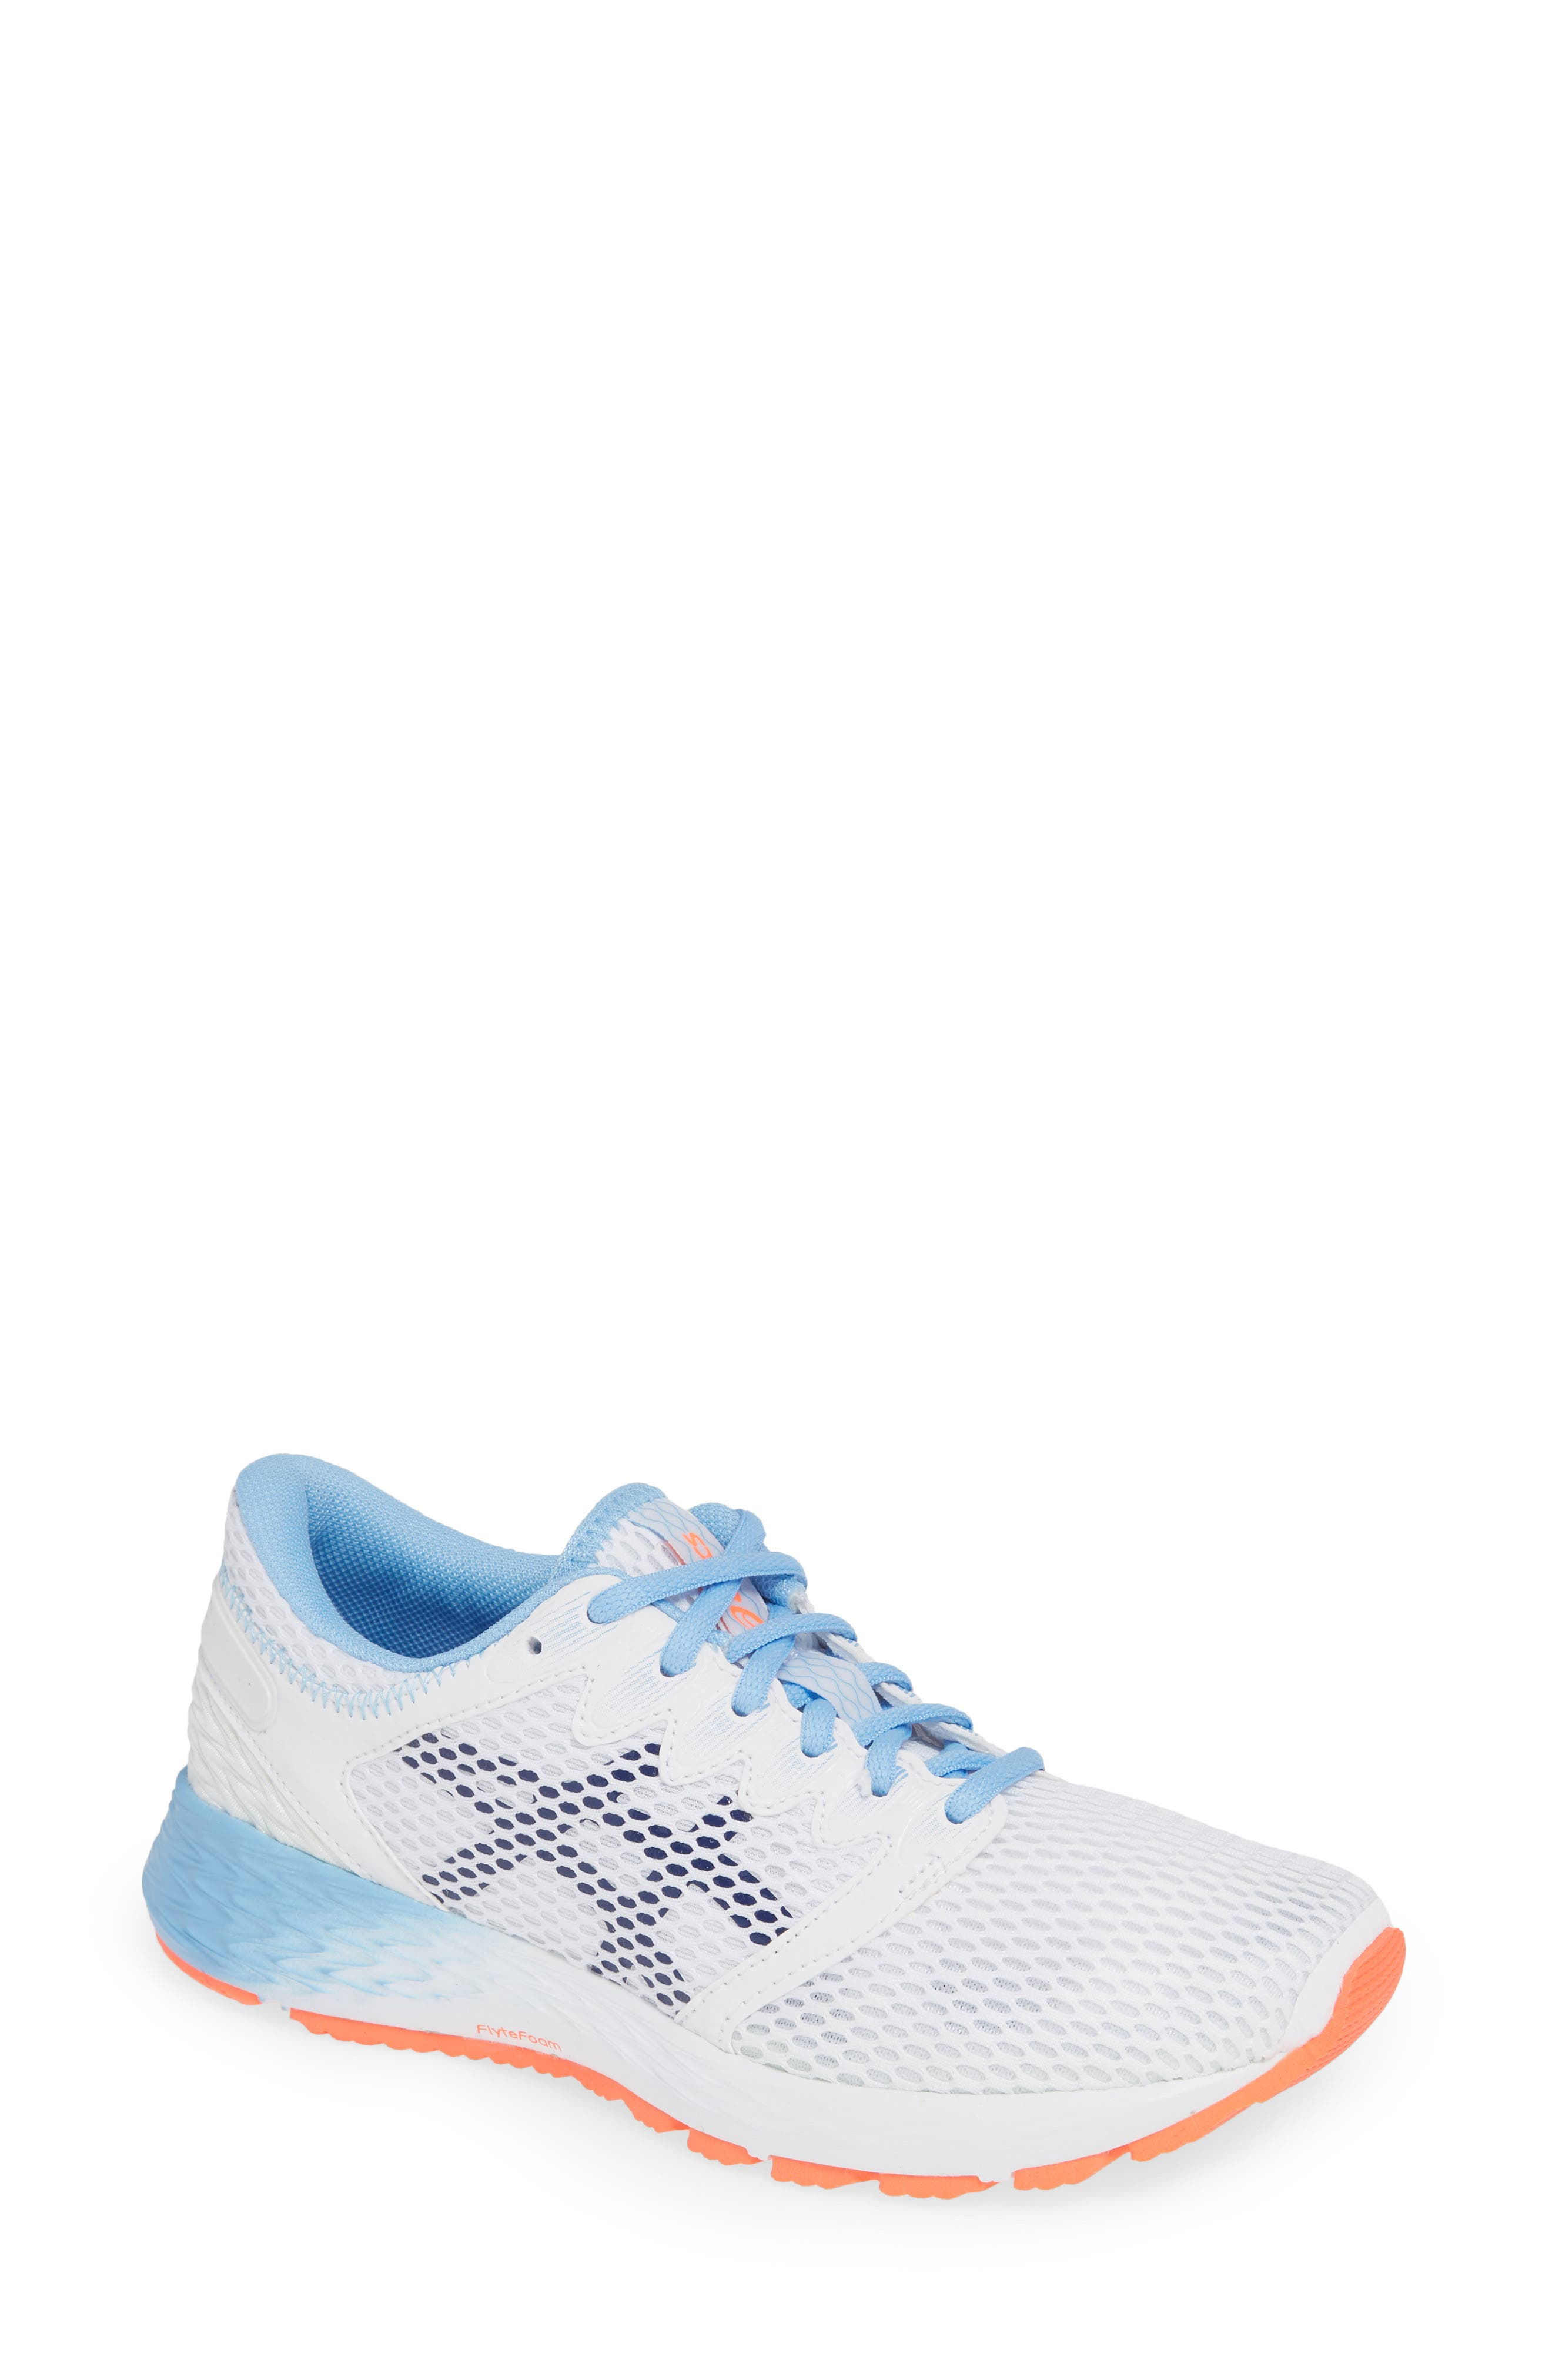 Asics Roadhawk Ff 2 Running Shoe, White